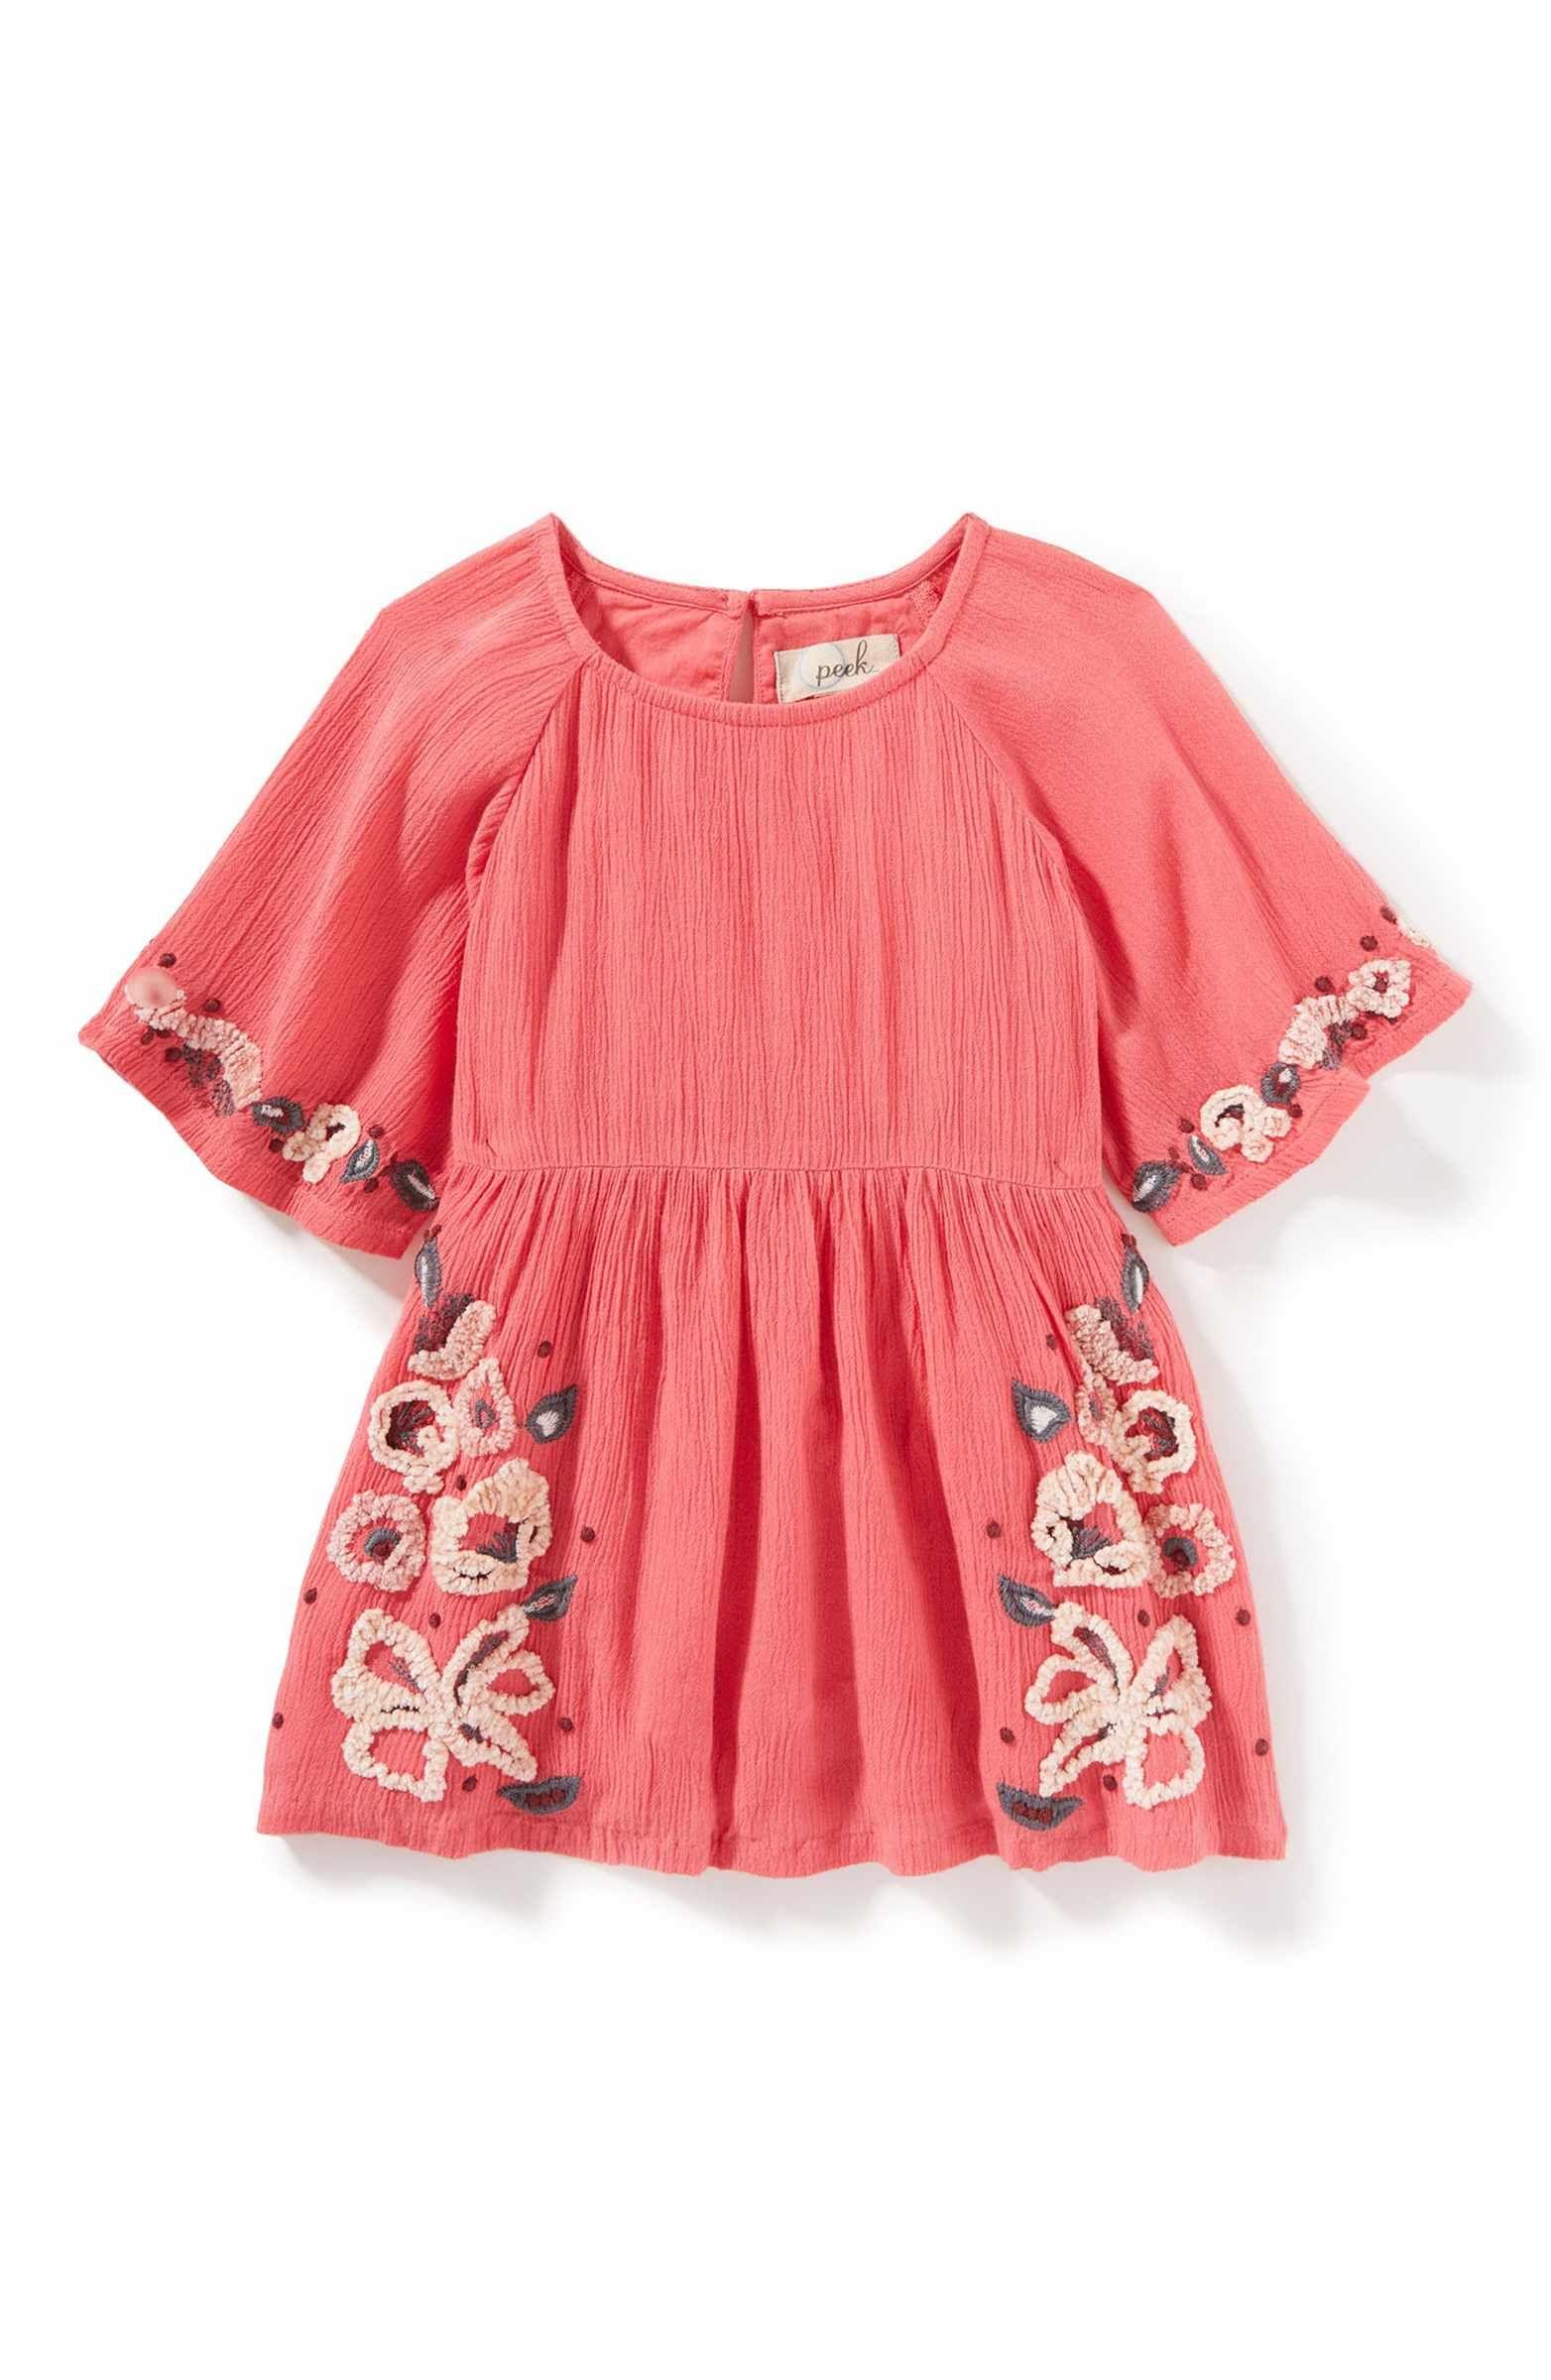 Main Image Peek Eva Gauze Dress Baby Girls